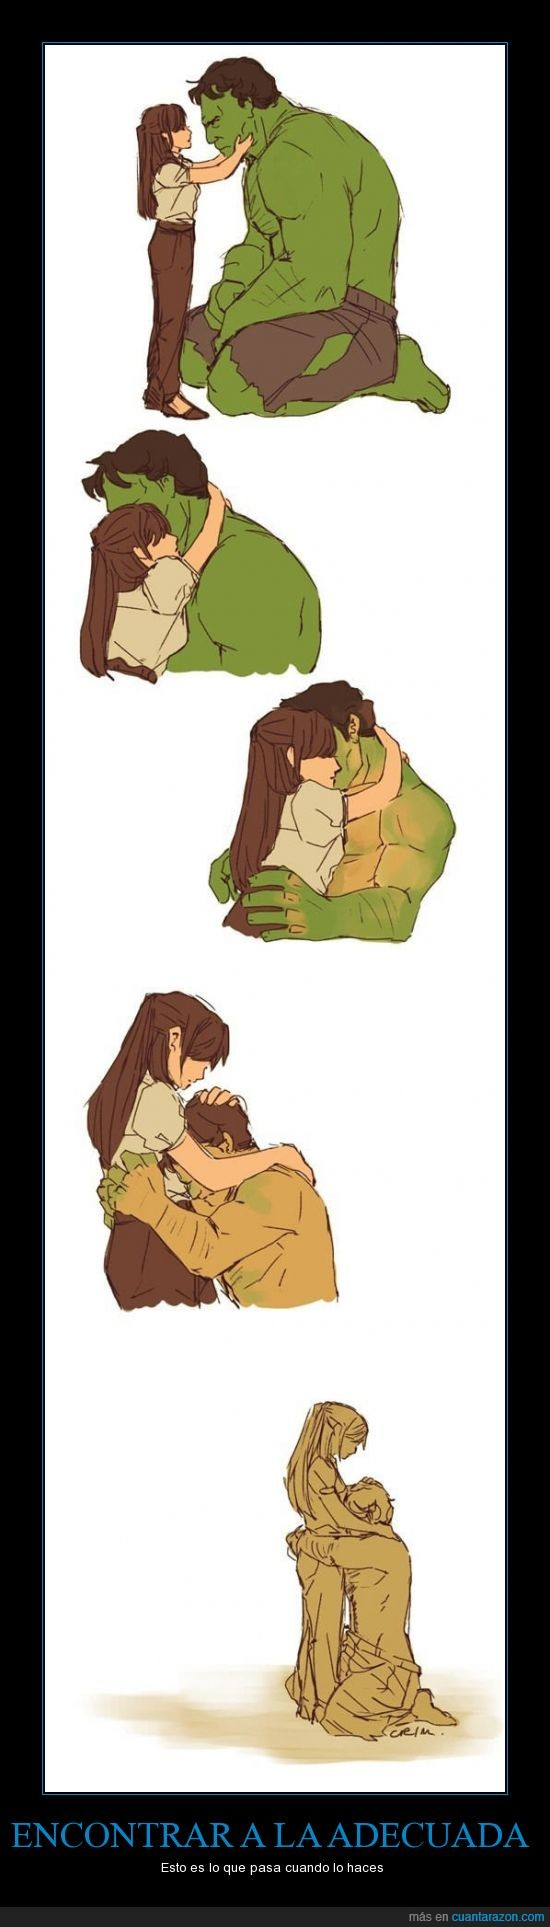 calmar,demonio,destrozar,destruir,hulk,mujer,parar